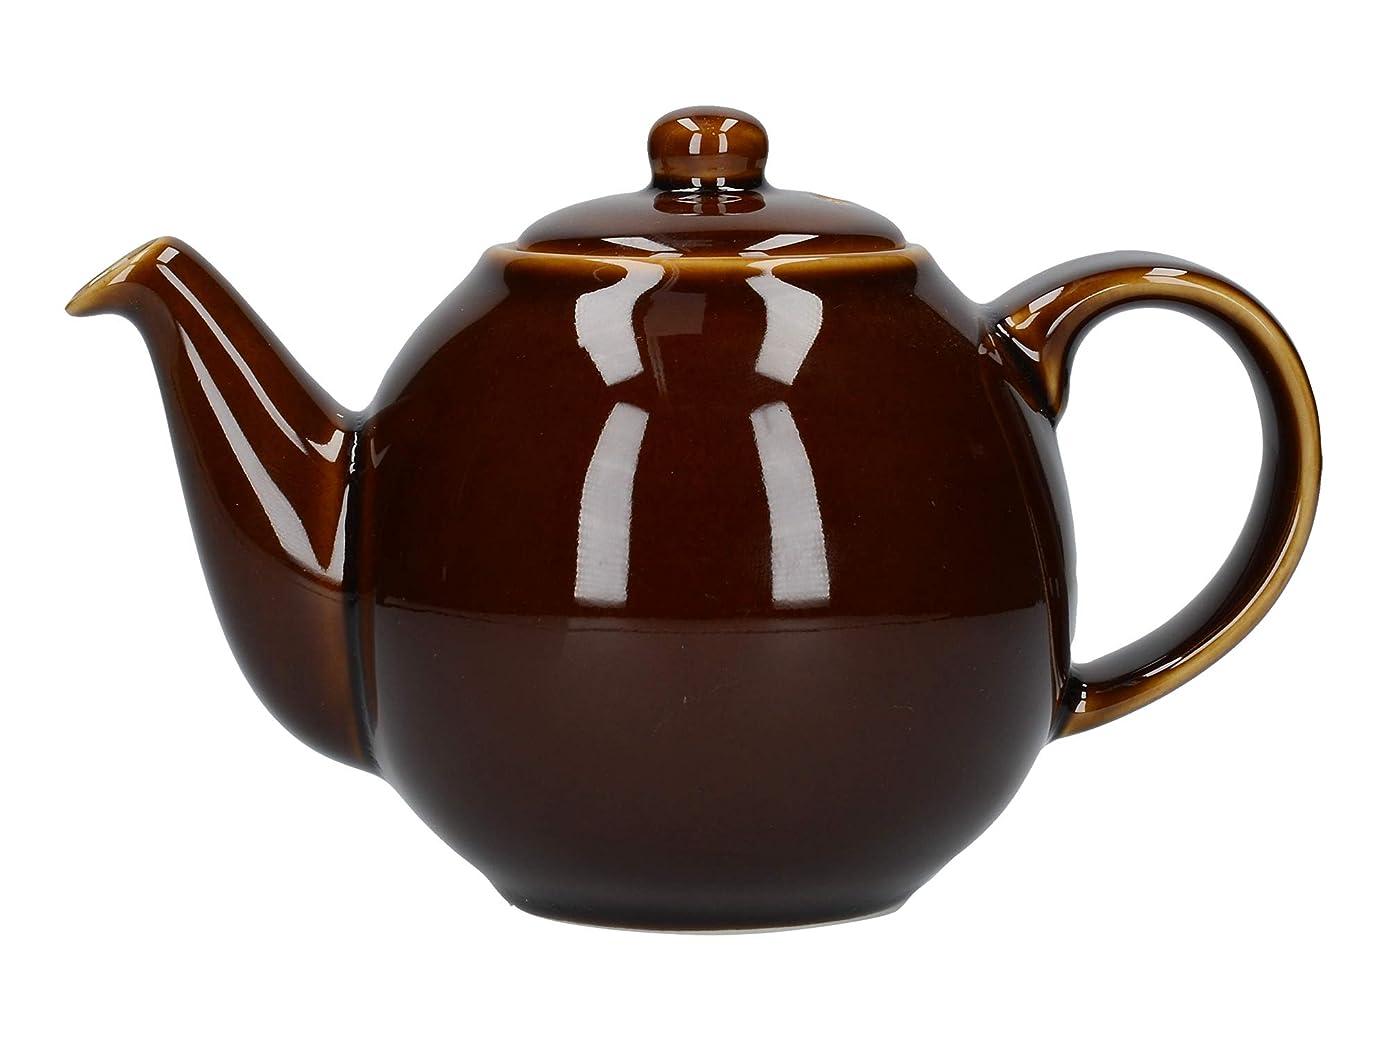 London Pottery Globe Teapot, Rockingham Brown, 2 Cup, Closed Box